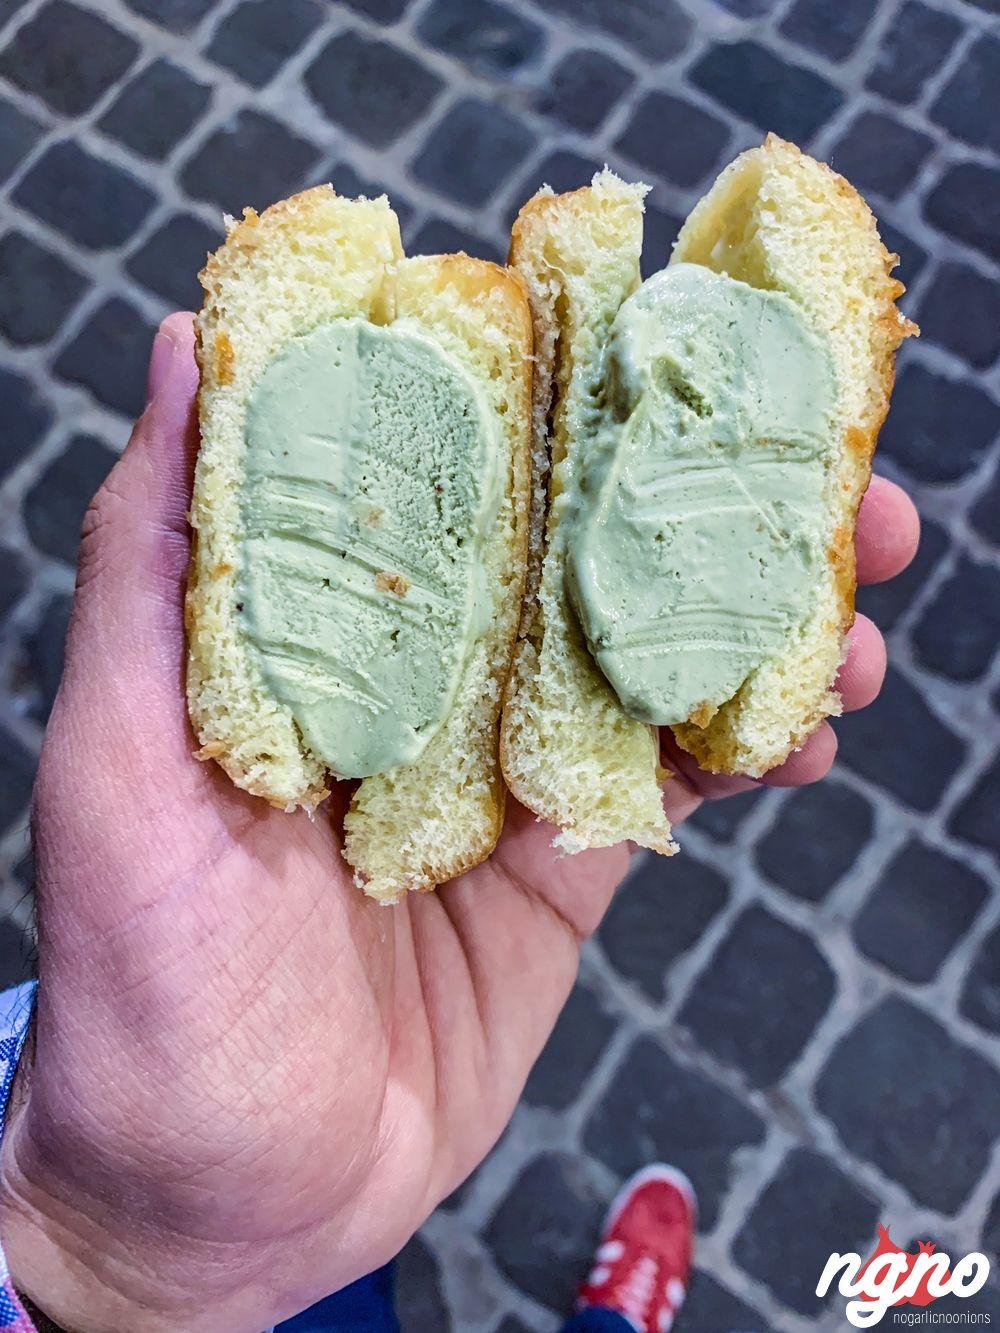 souk-el-akel-thursday-street-food-lebanon-food-nogarlicnoonions-1352018-11-18-01-43-26